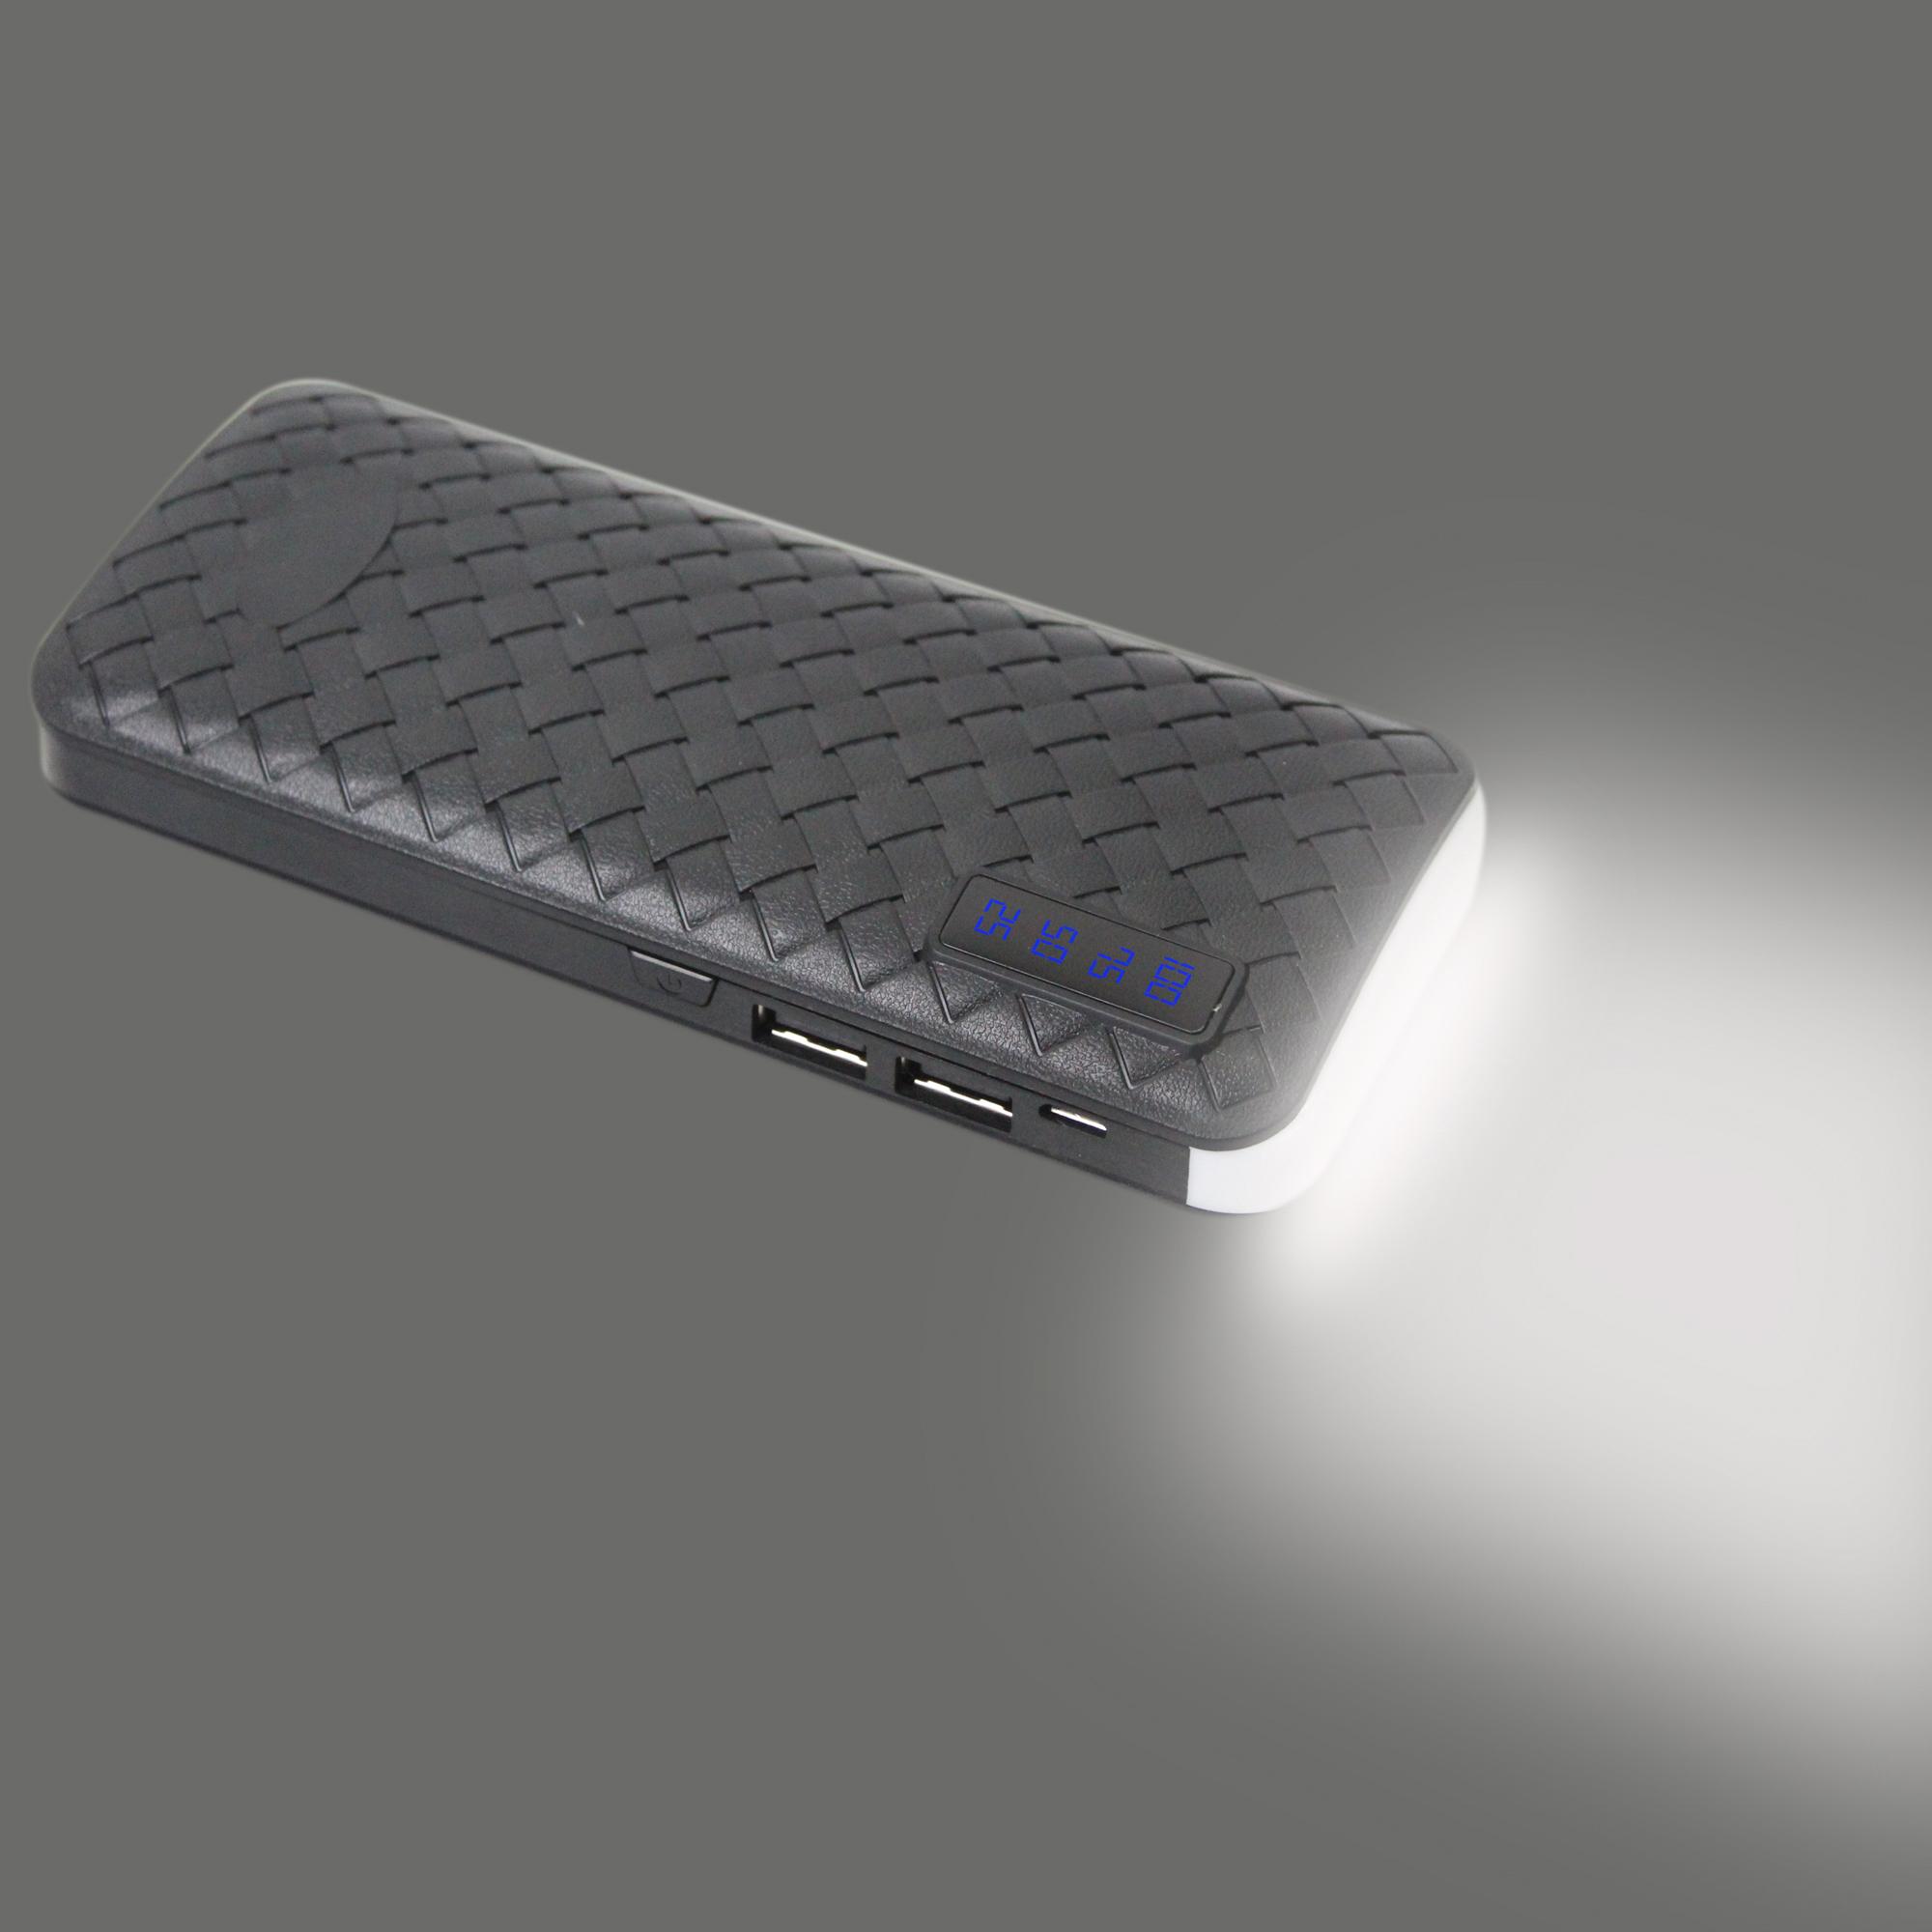 Power Bank Croco-LED 10000mAh